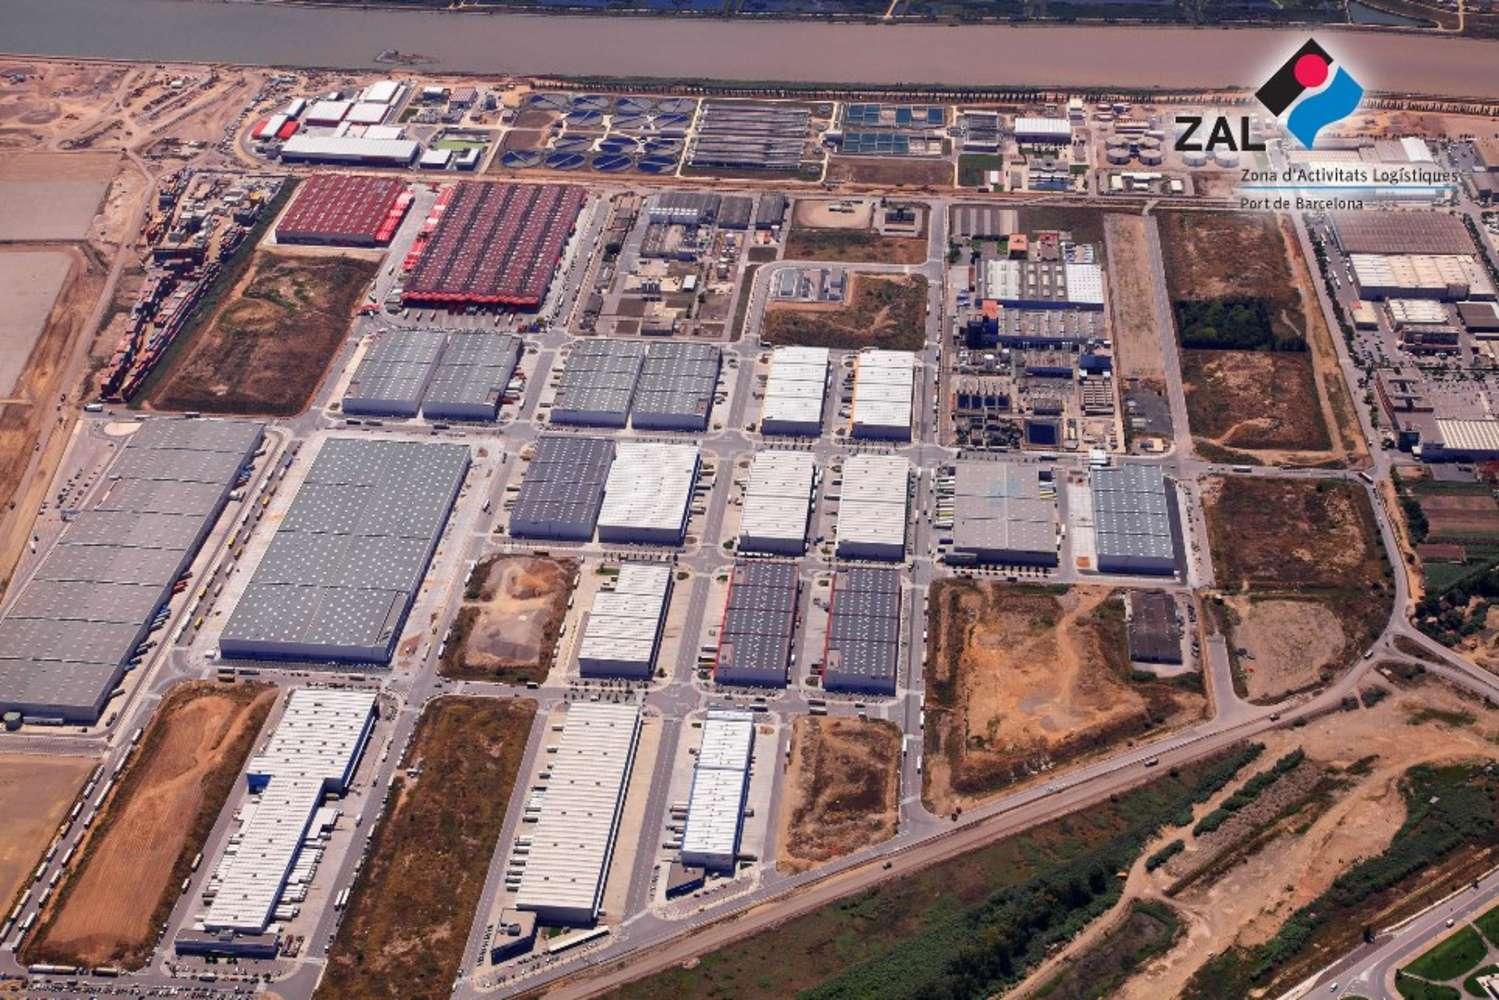 Naves industriales y logísticas El prat de llobregat, 08820 - Nave Logística - B0143 - PI ZAL II - 3335